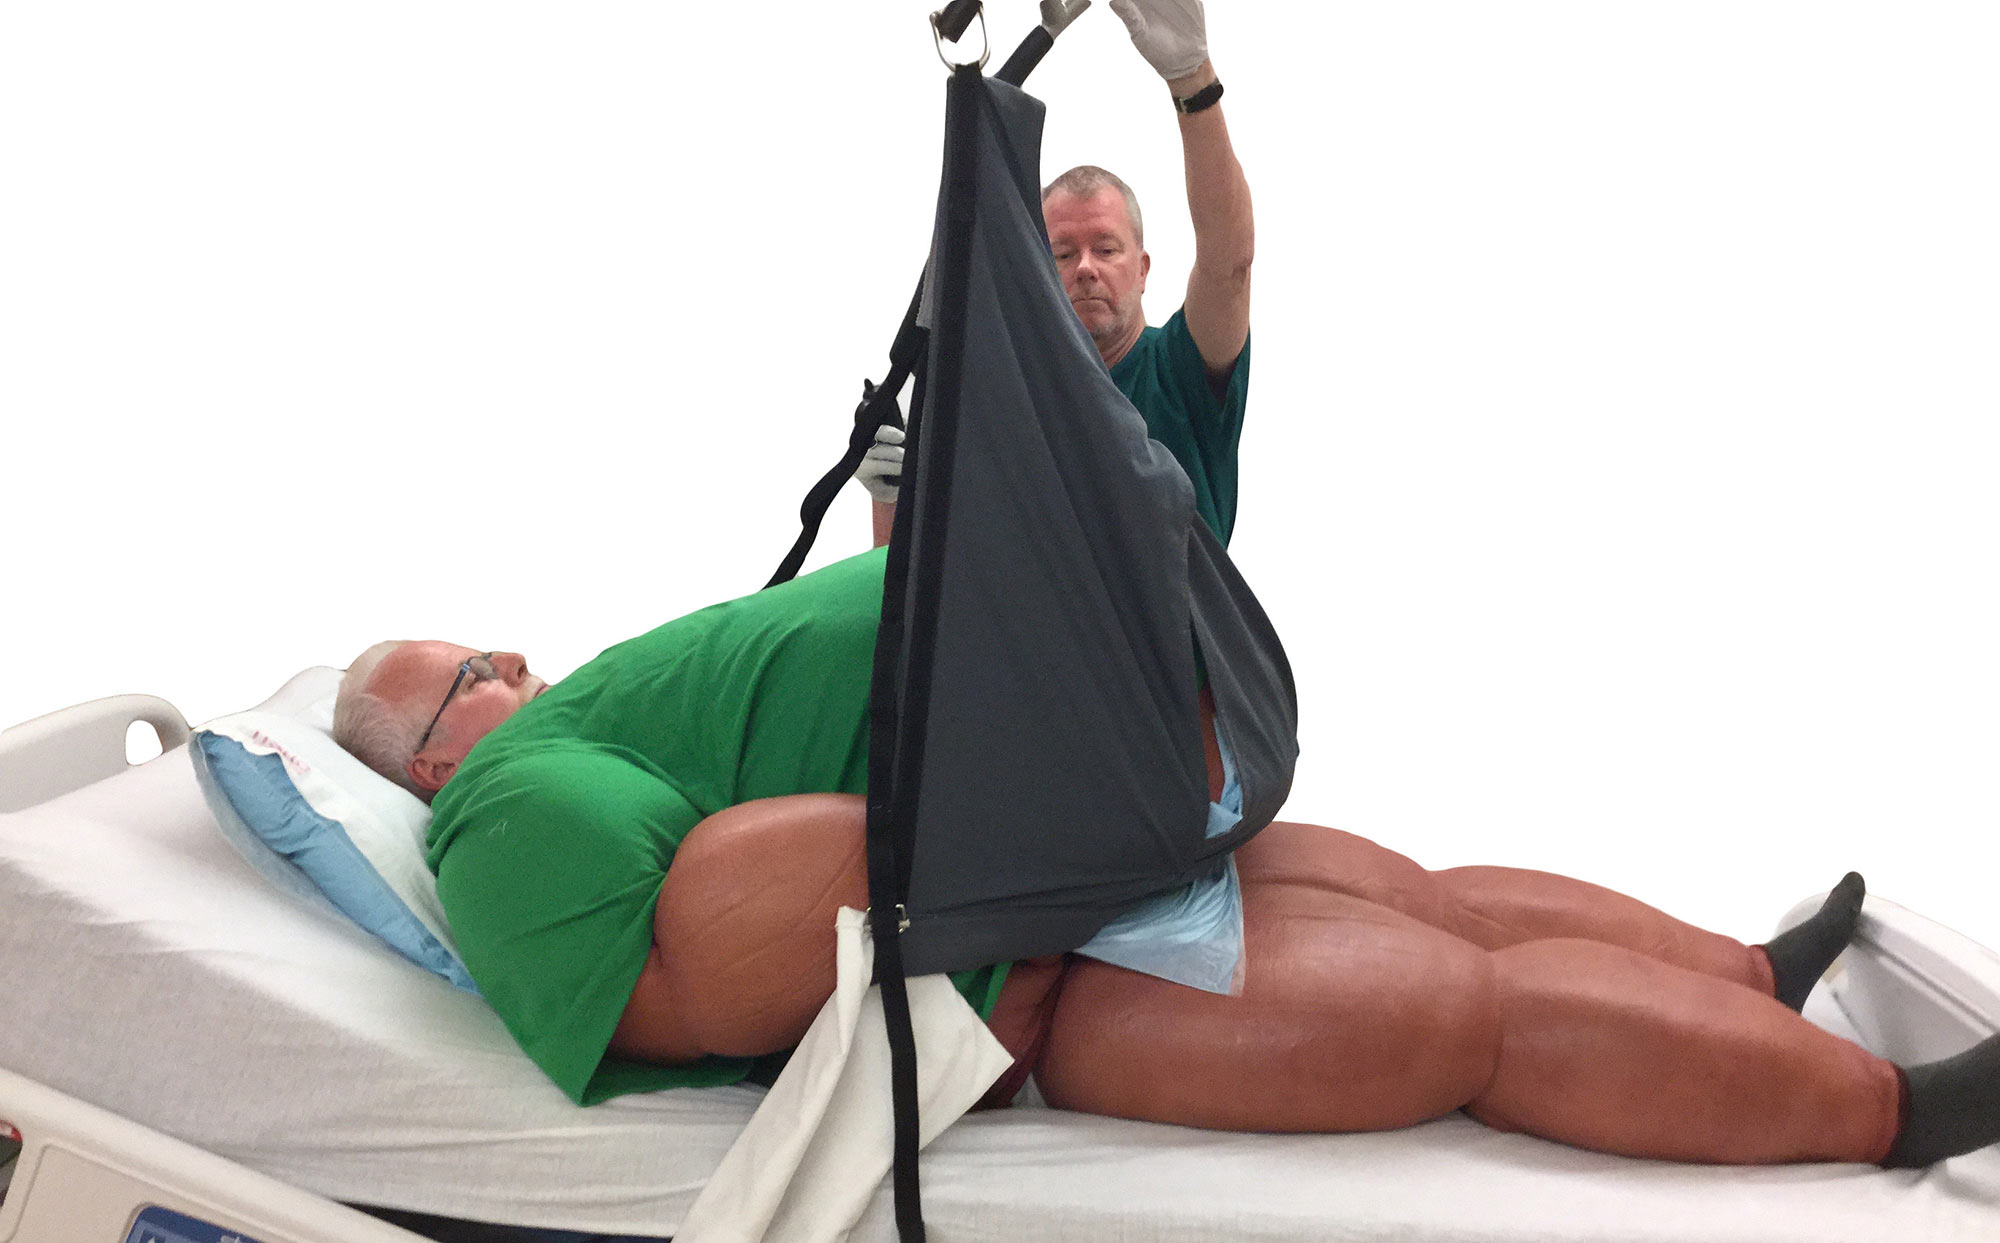 pannus sling